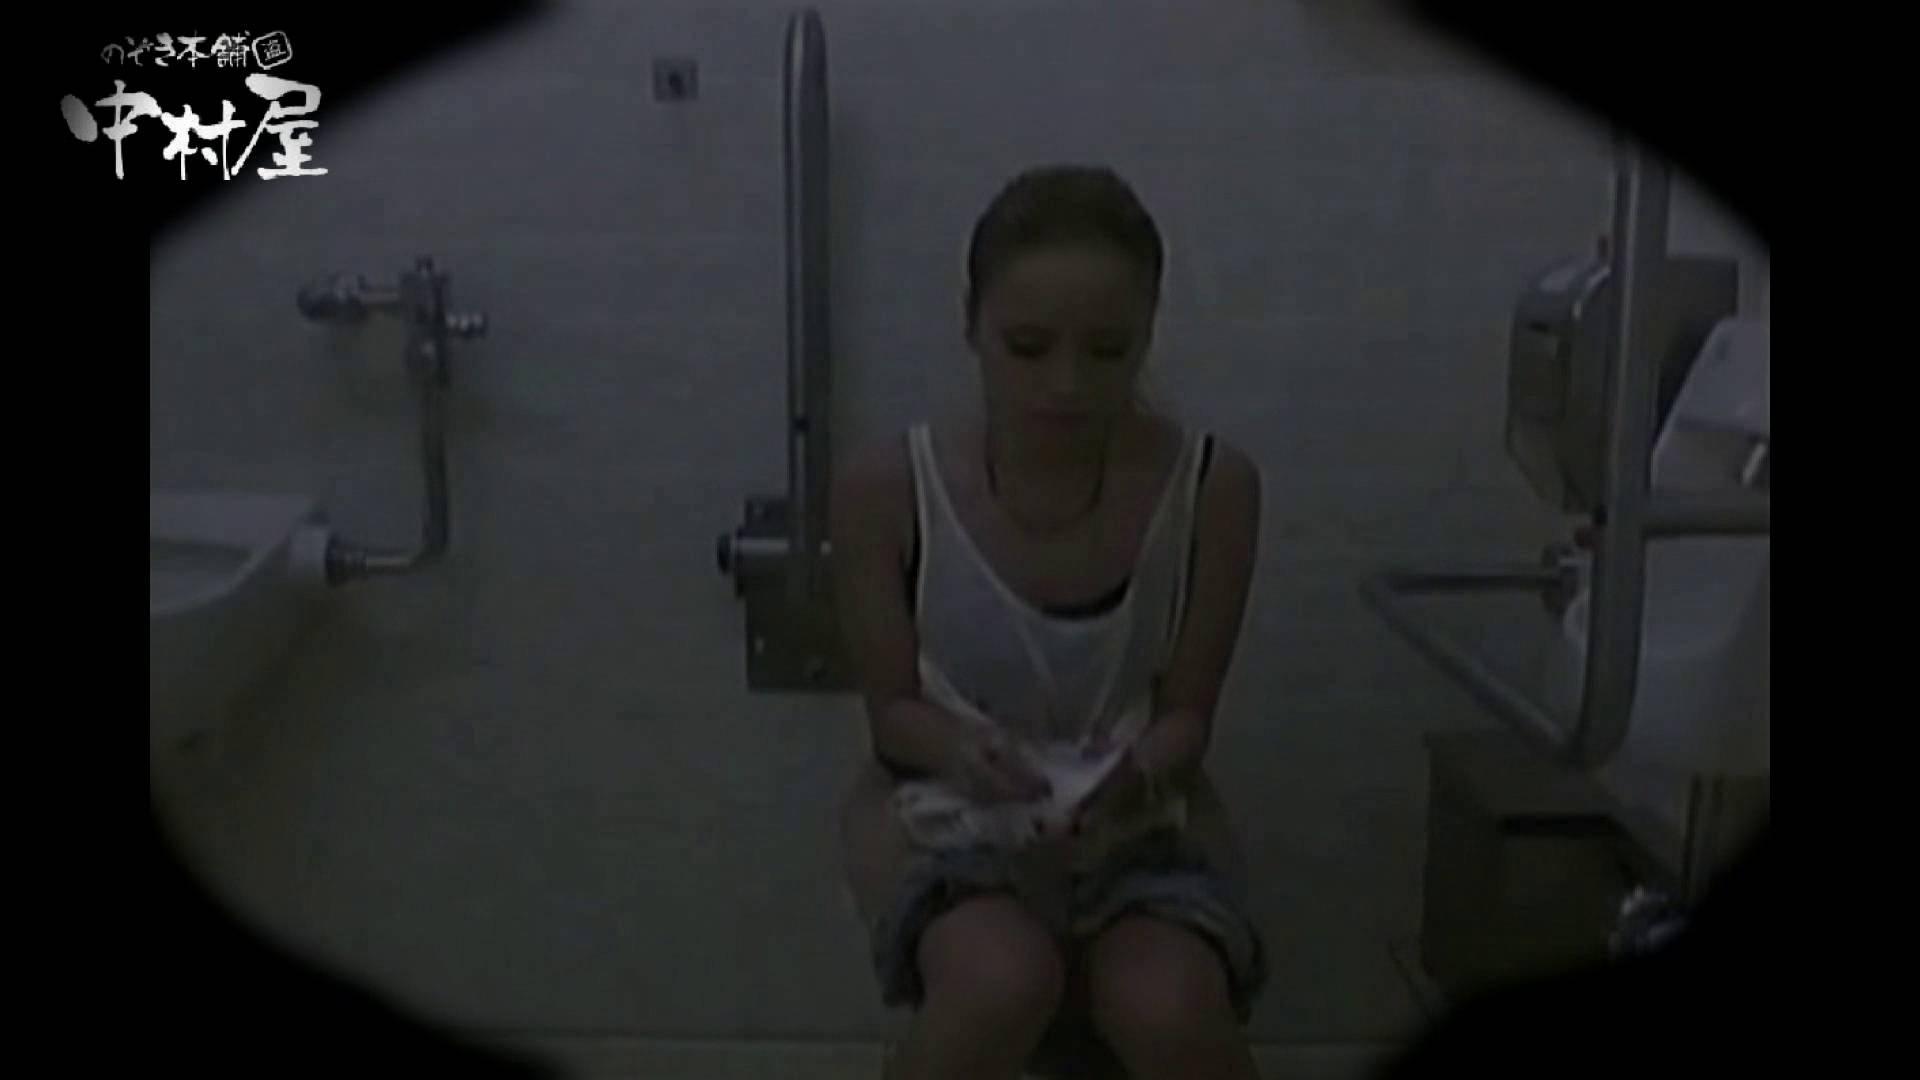 teen galトイレ覗き紙がナイ編‼vol.10 0  88pic 88